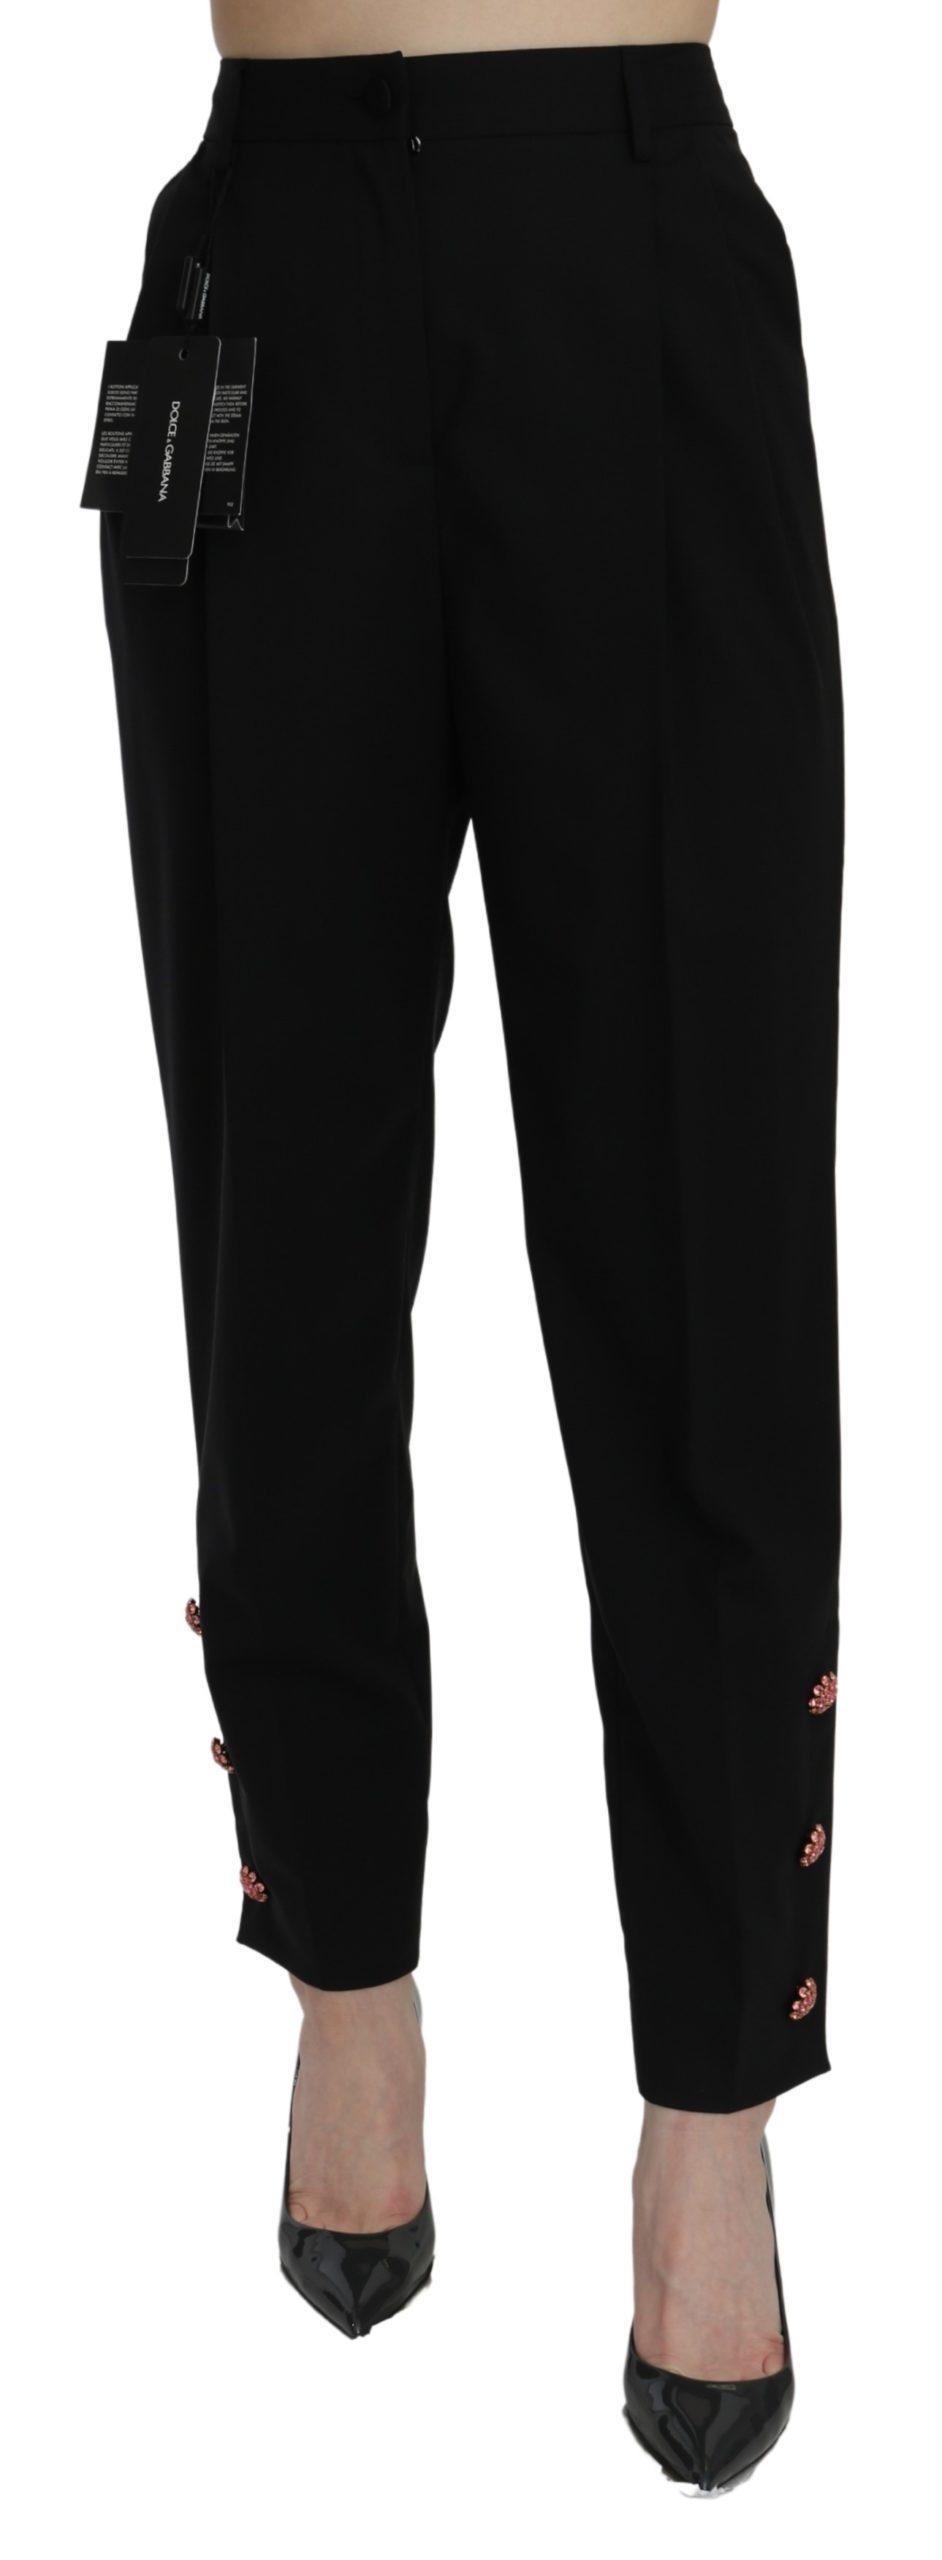 Dolce & Gabbana Women's Crystal High Waist Cotton Trouser Black PAN71015 - IT42 M